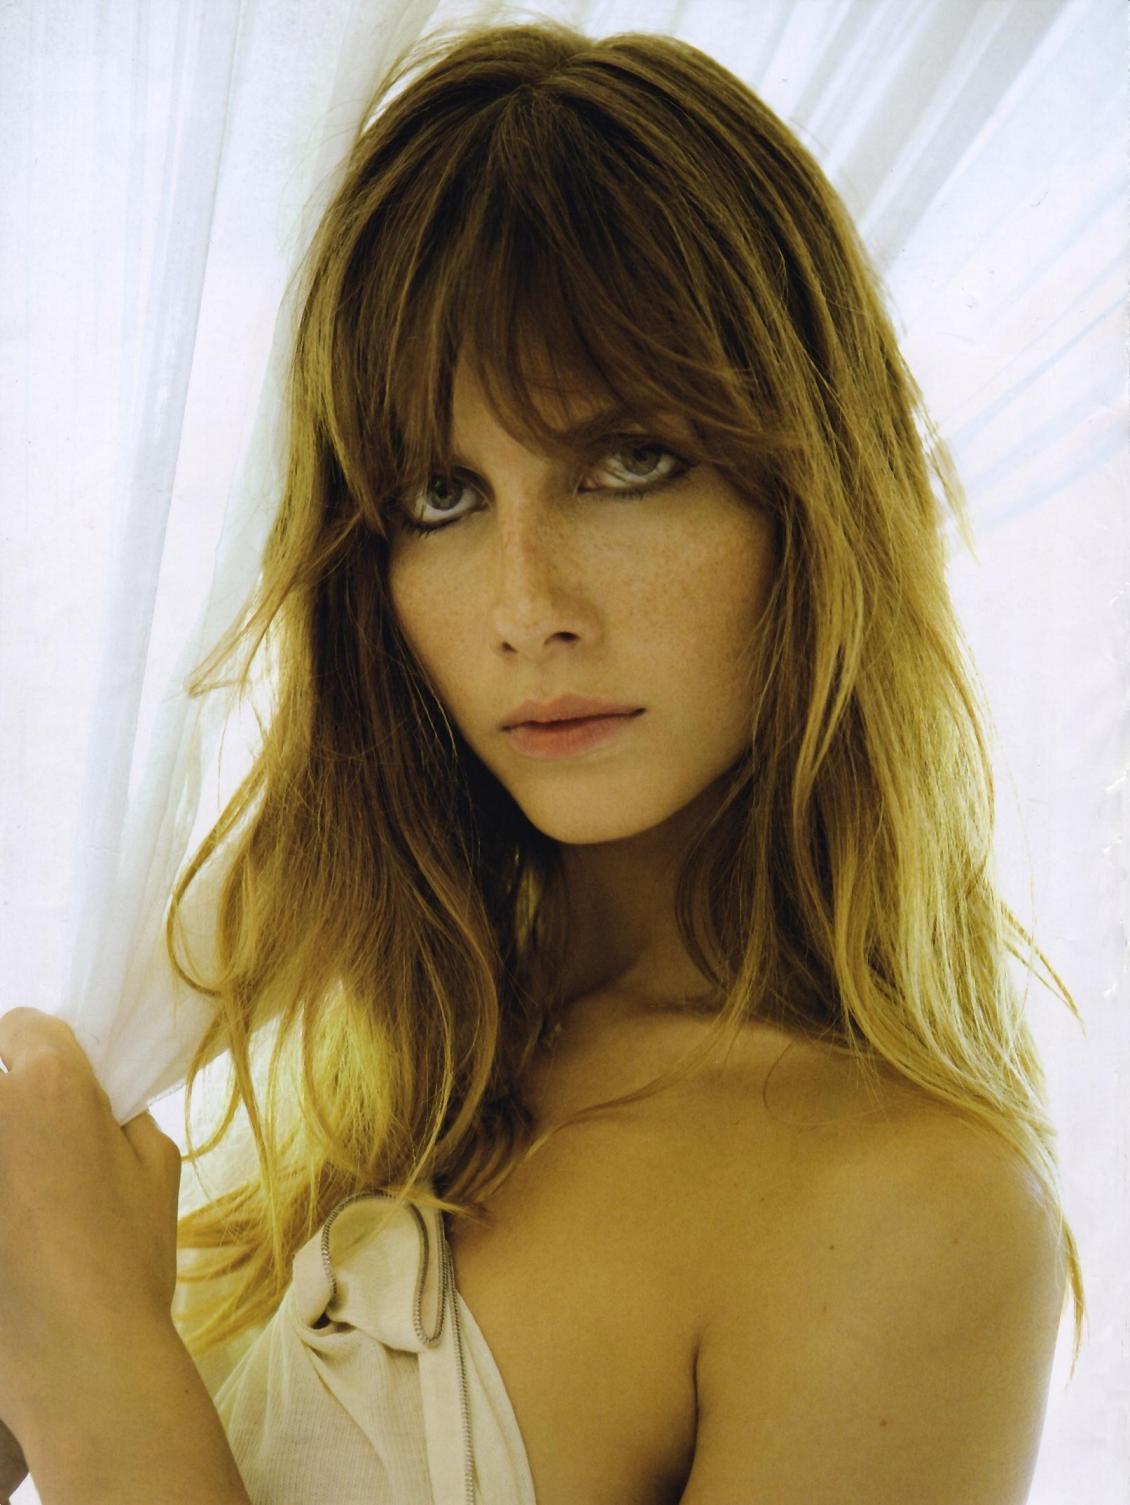 Ana Claudia Michels 2 1999-2000 nudes (32 images) Gallery, iCloud, legs